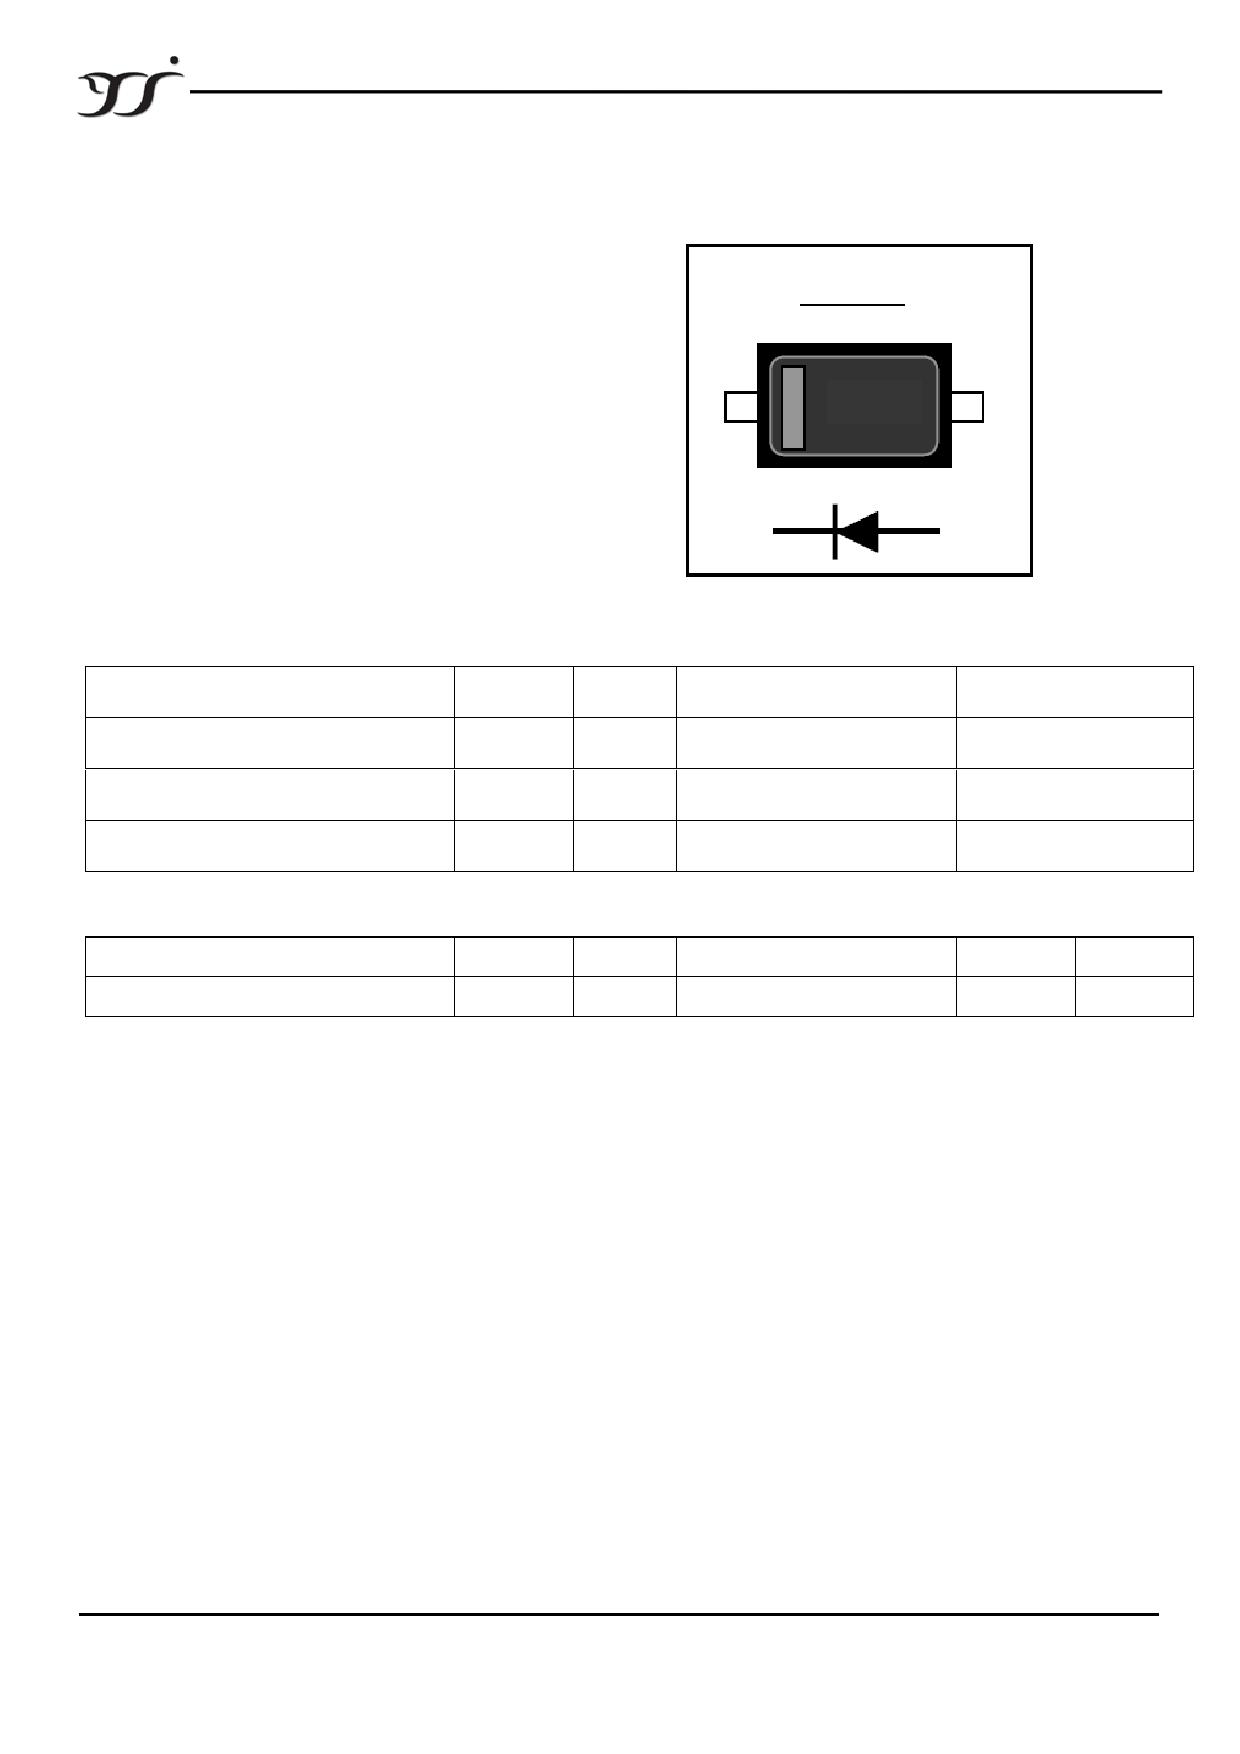 MMSZ5226B Datasheet